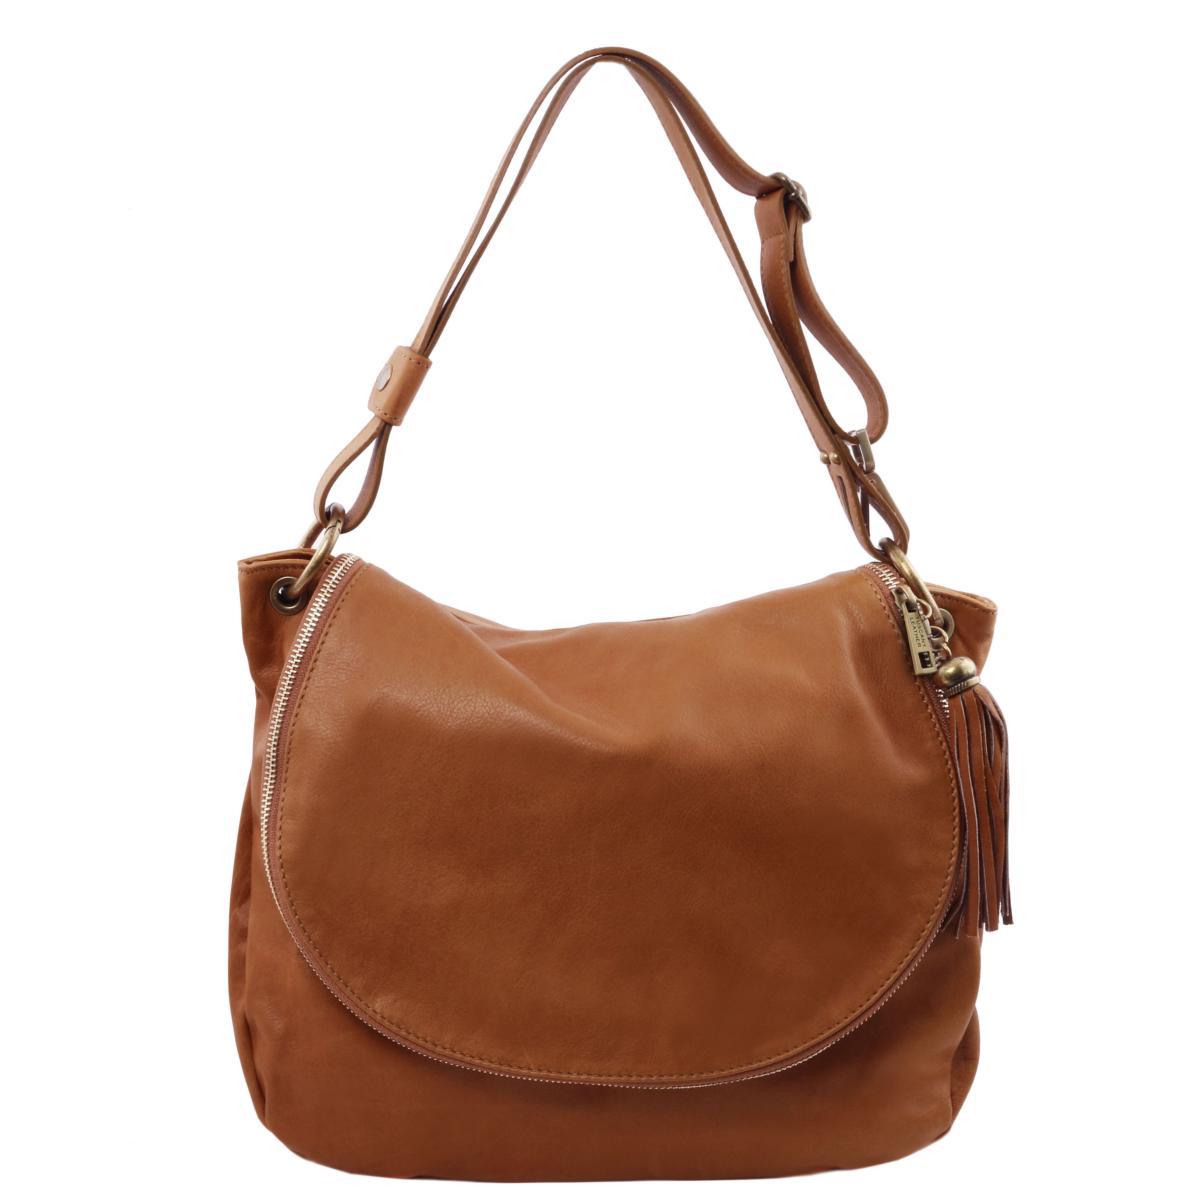 Grand Sac Cuir Bandoulière Besace Femme Marron -Tuscany Leather-